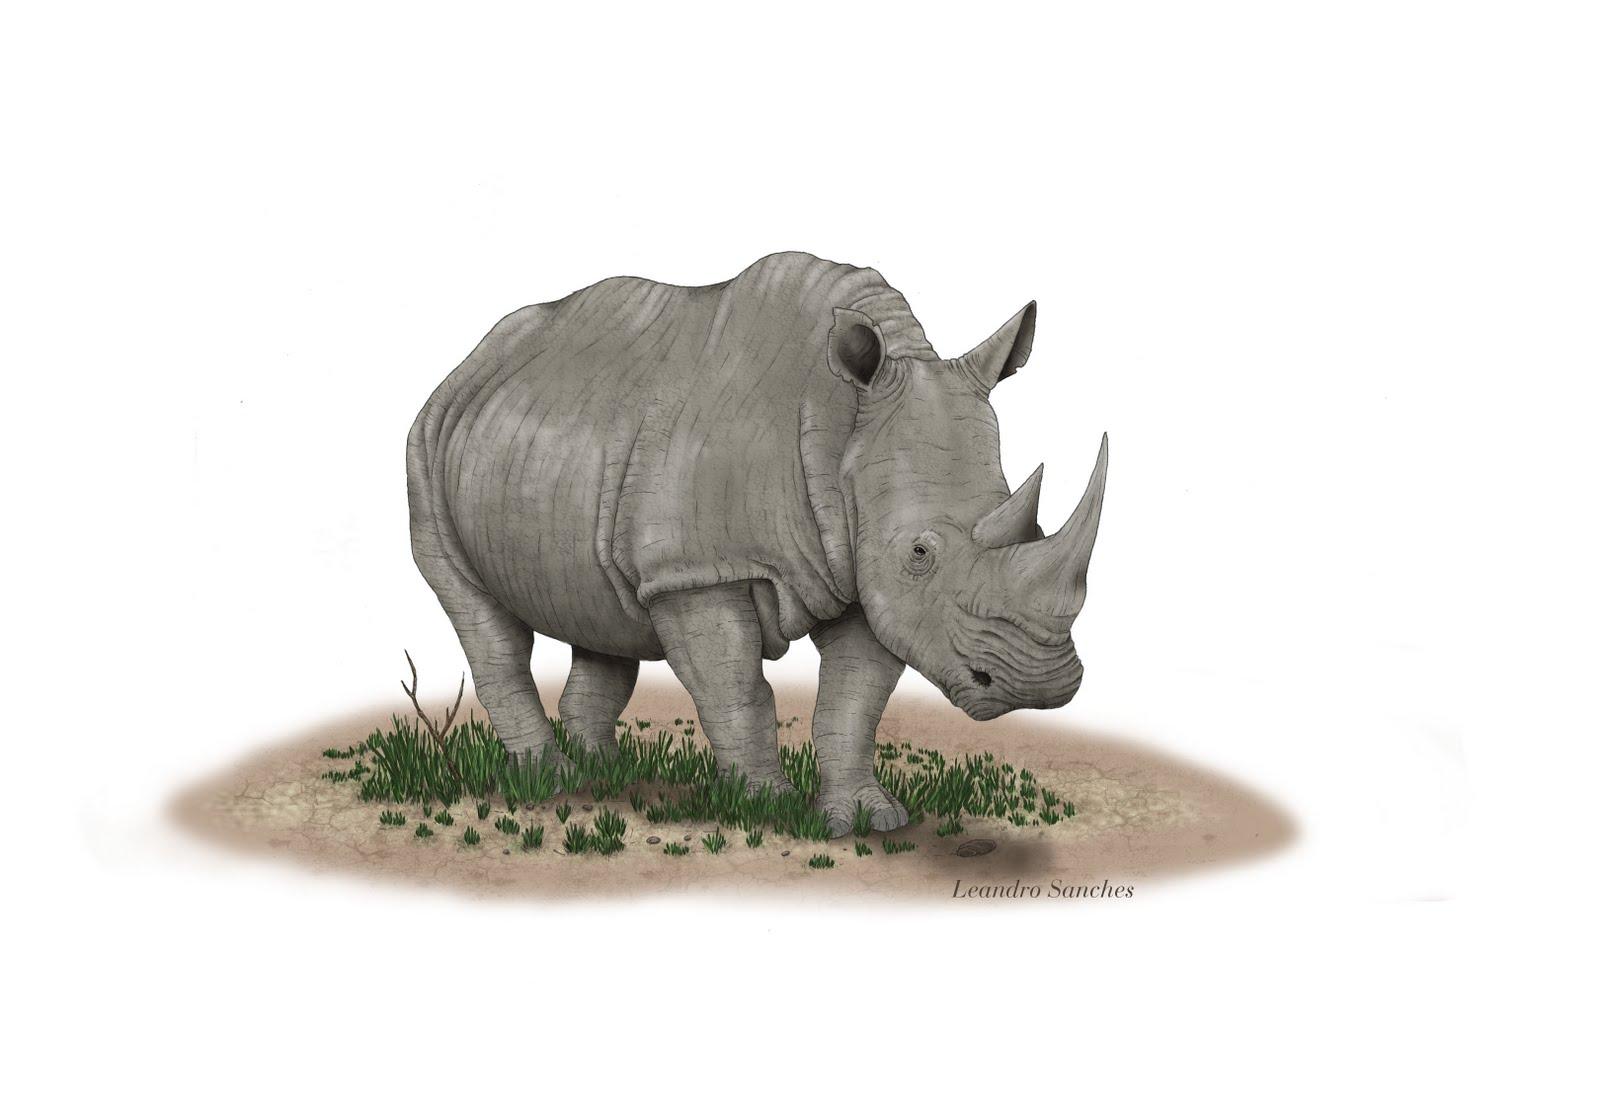 http://3.bp.blogspot.com/-RAMSHLtNBjs/ThfOAvyJNmI/AAAAAAAAARg/1wFMgDrCVR4/s1600/rinoceronte.jpg